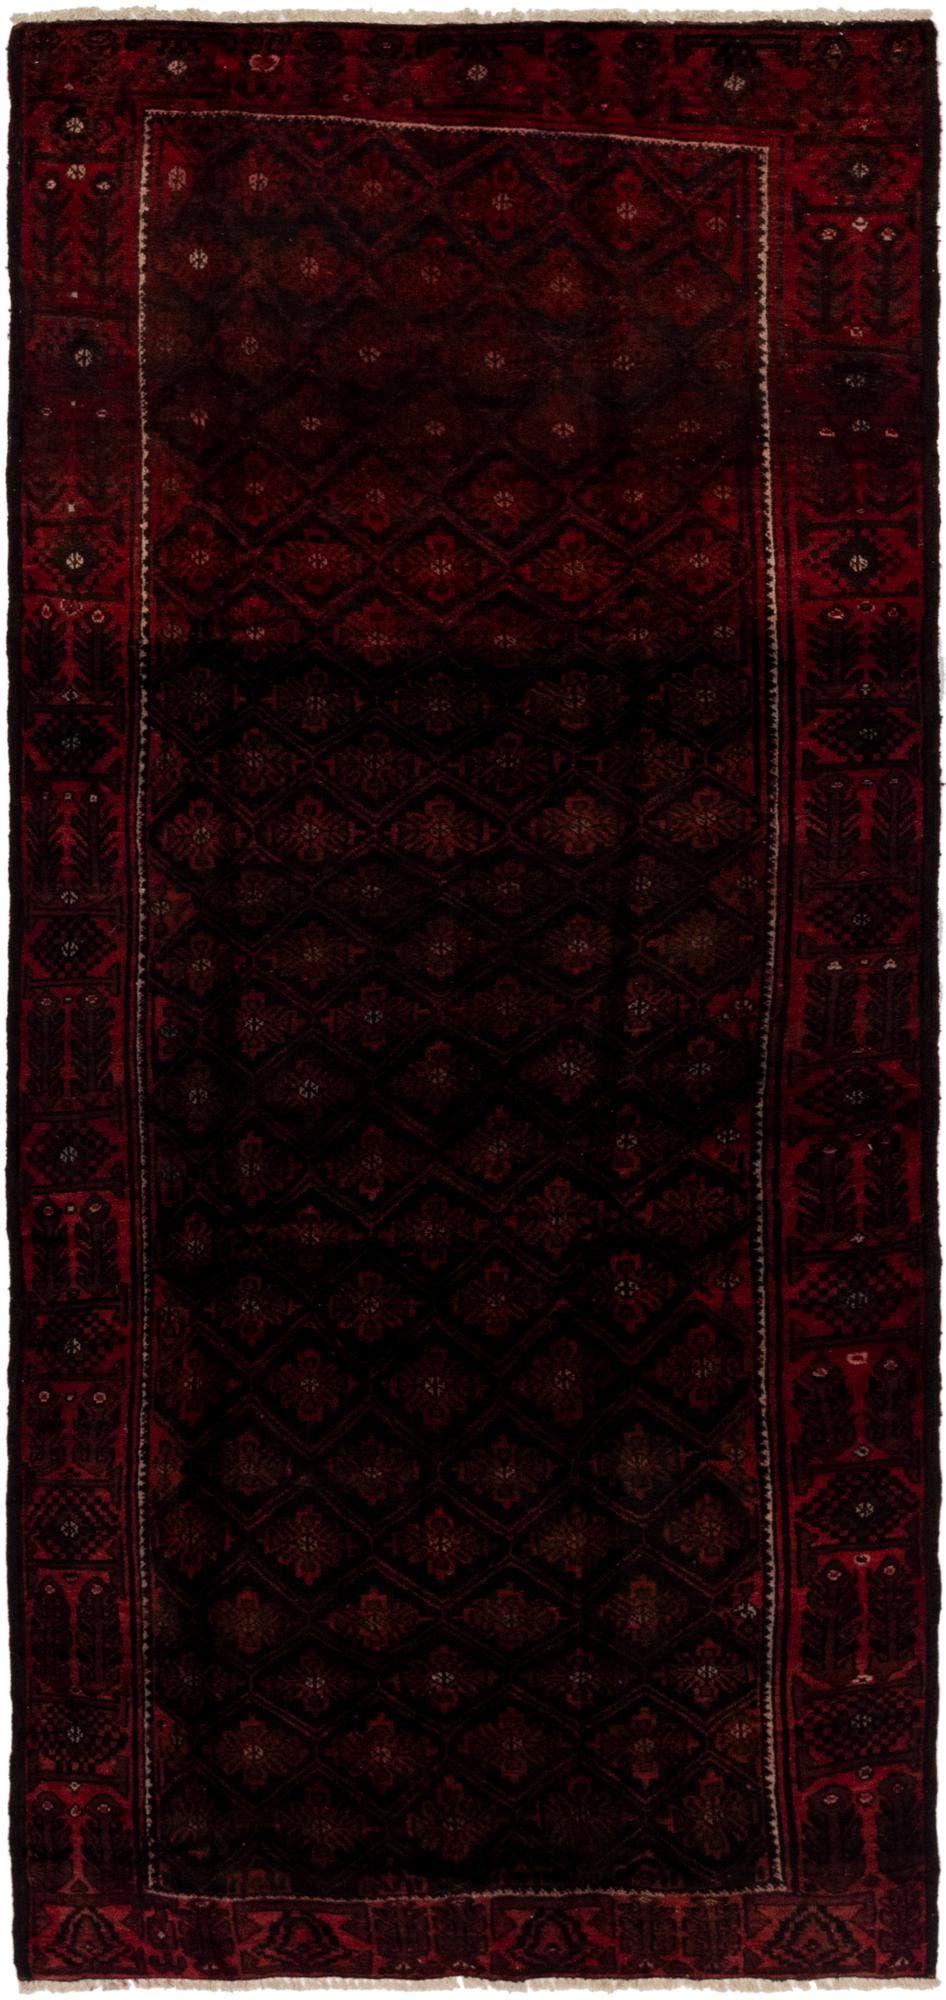 4' 6 x 10' 5 Balouch Persian Runner Rug main image